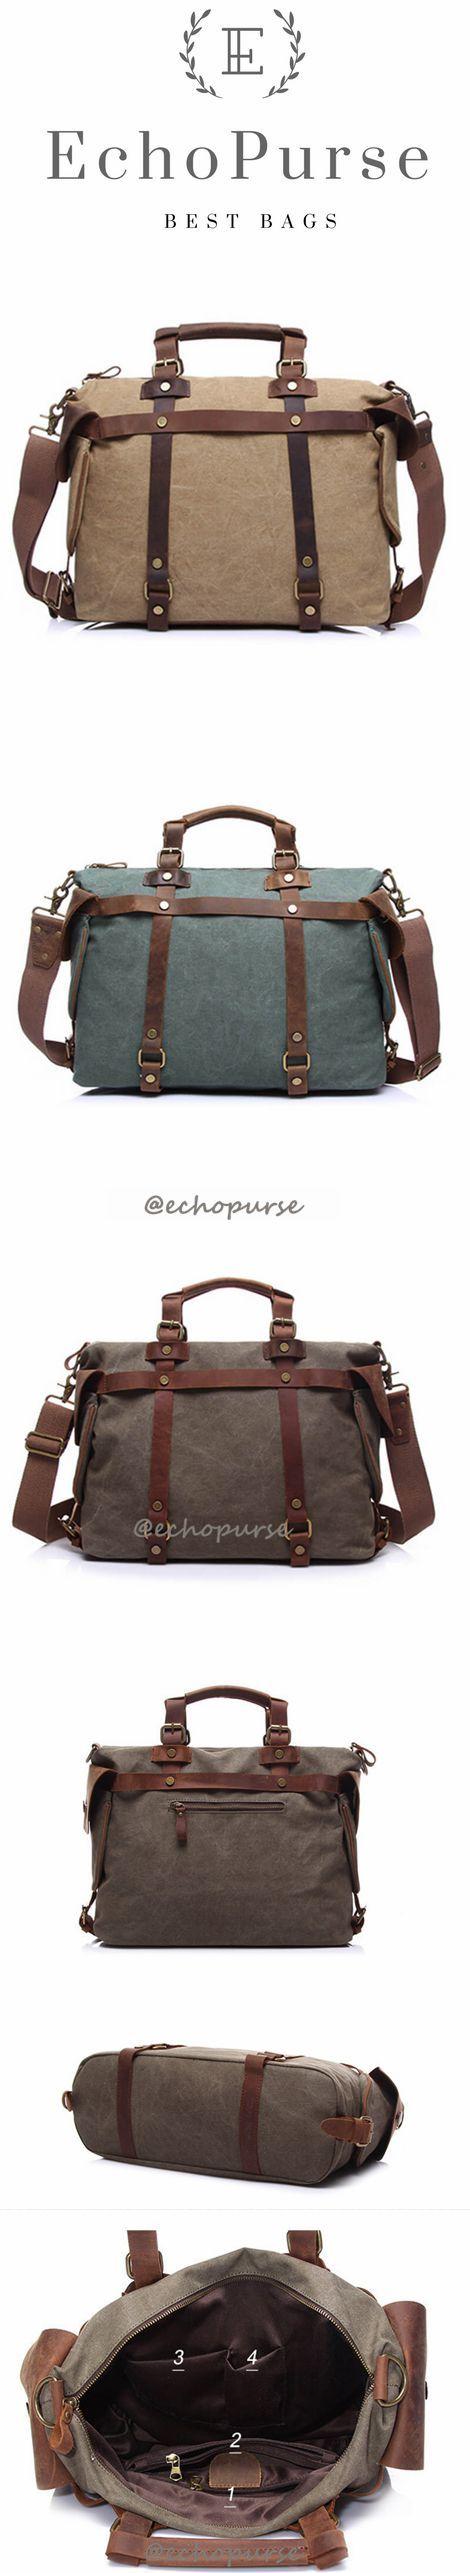 Canvas Travel Handbag, Vintage Large Capacity Crossbody Bag YD1801